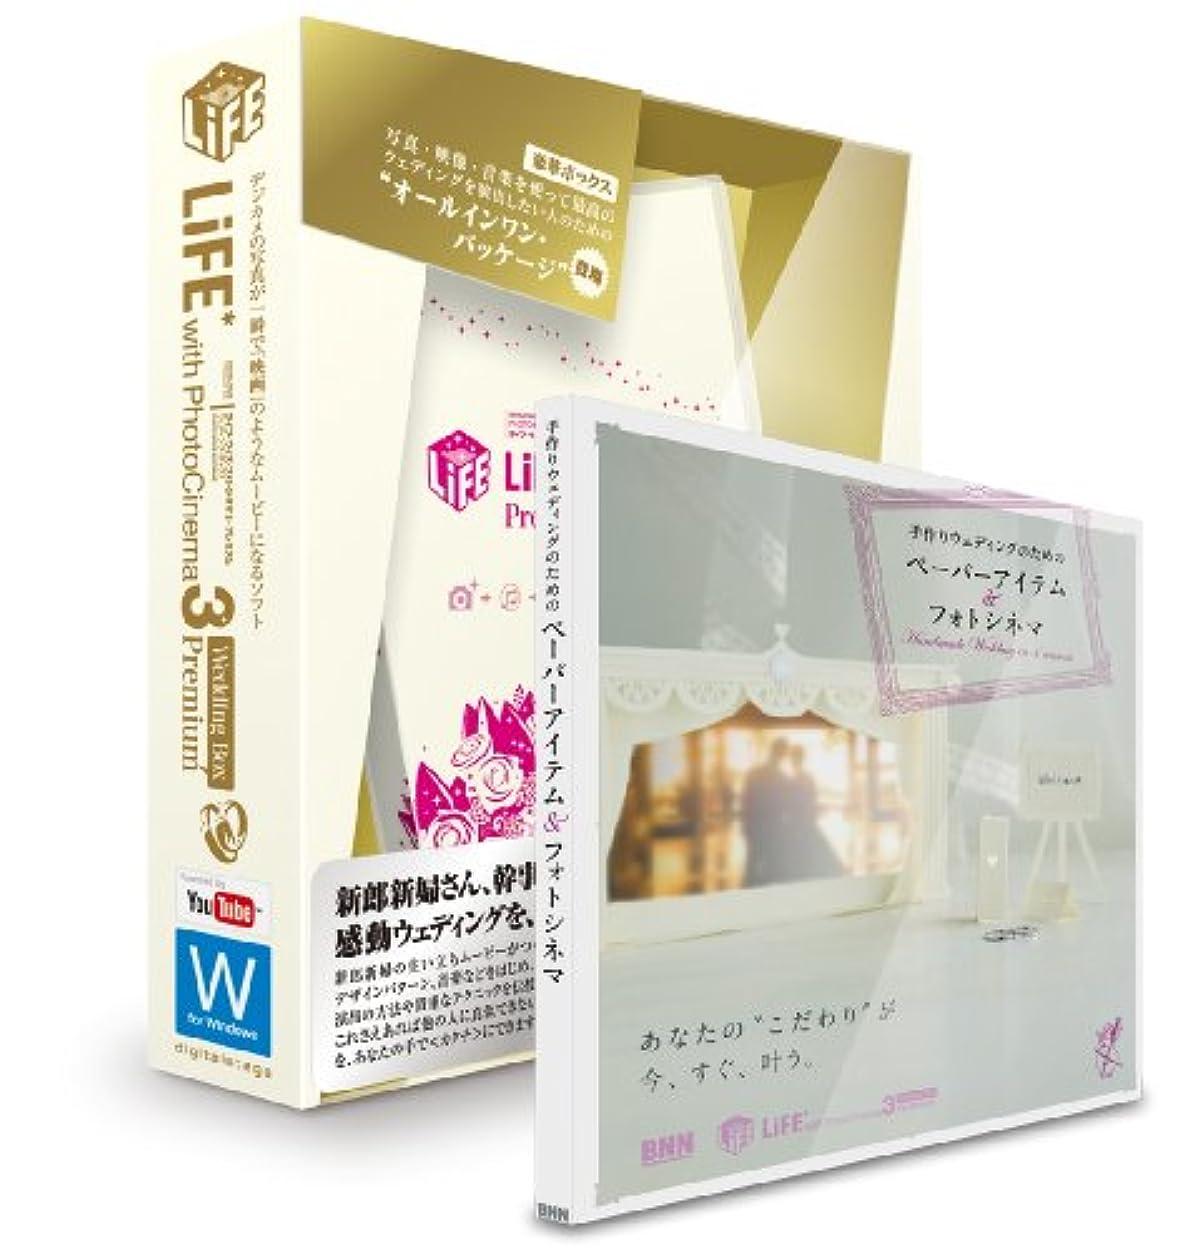 LiFE* with PhotoCinema 3 Premium ウェディングBOX Win 書籍付き [限定版]